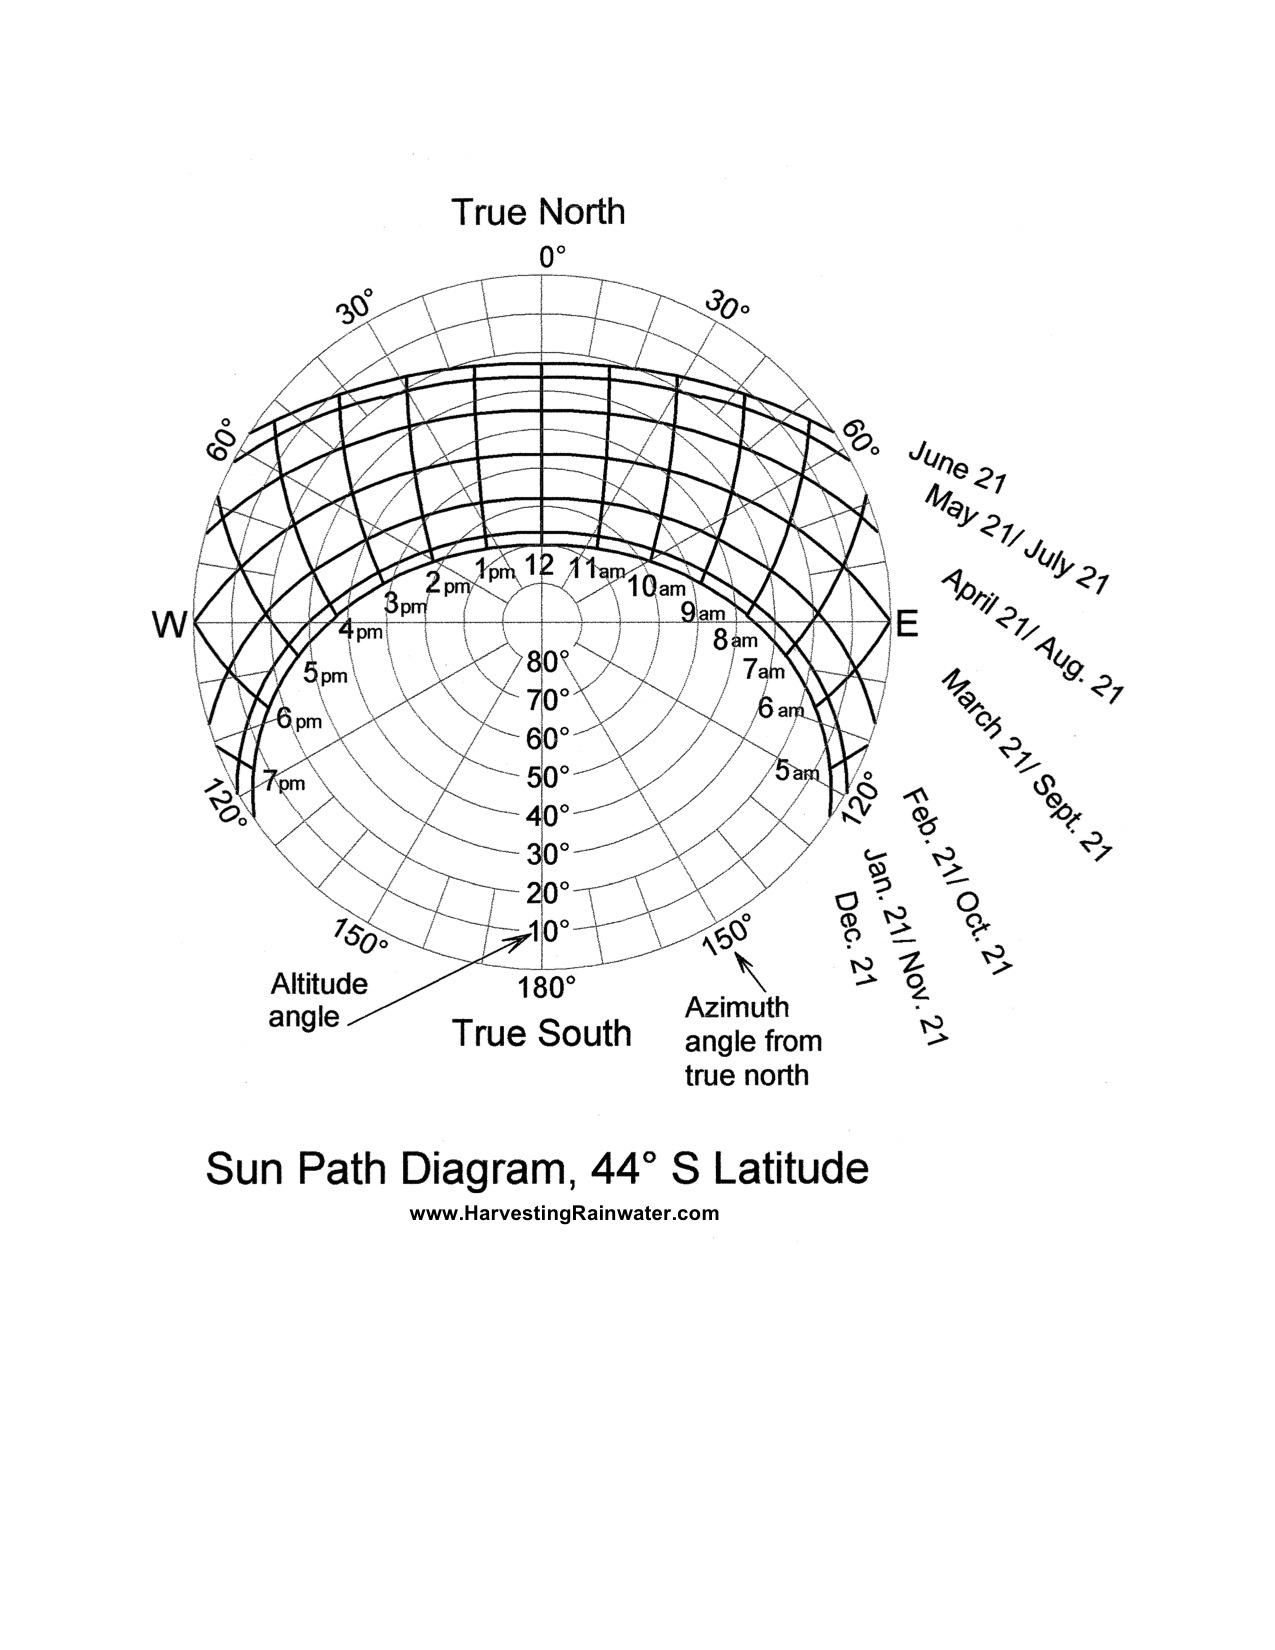 Sun Path Diagram 44o S Latitude